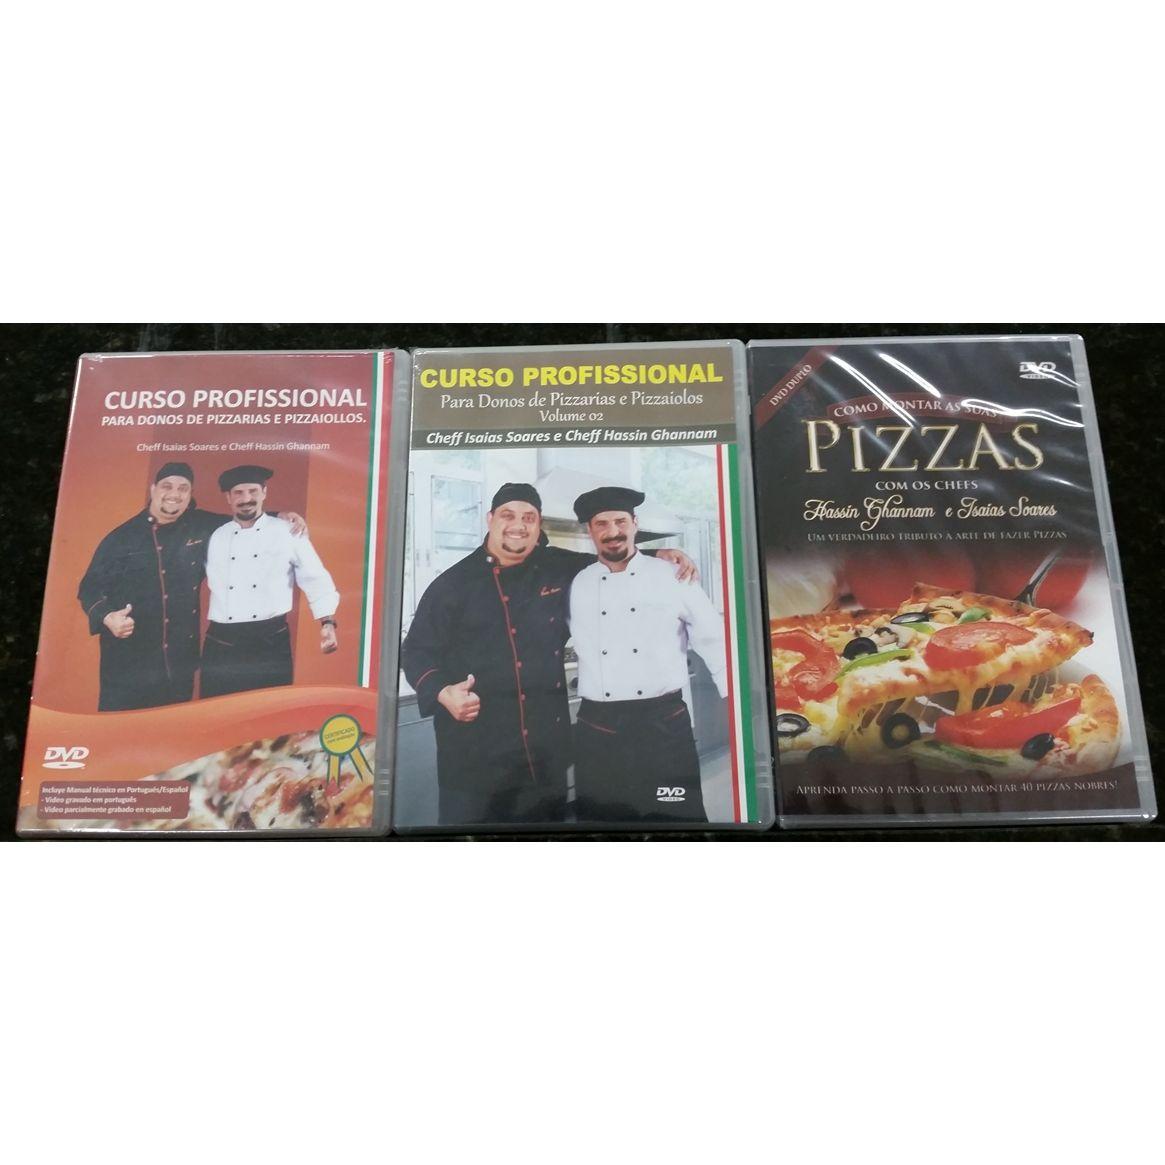 TRILOGIA DOS DVDs  VOLUMES I, II,II POR SEDEX  - Fórum de Pizzas Vendas online